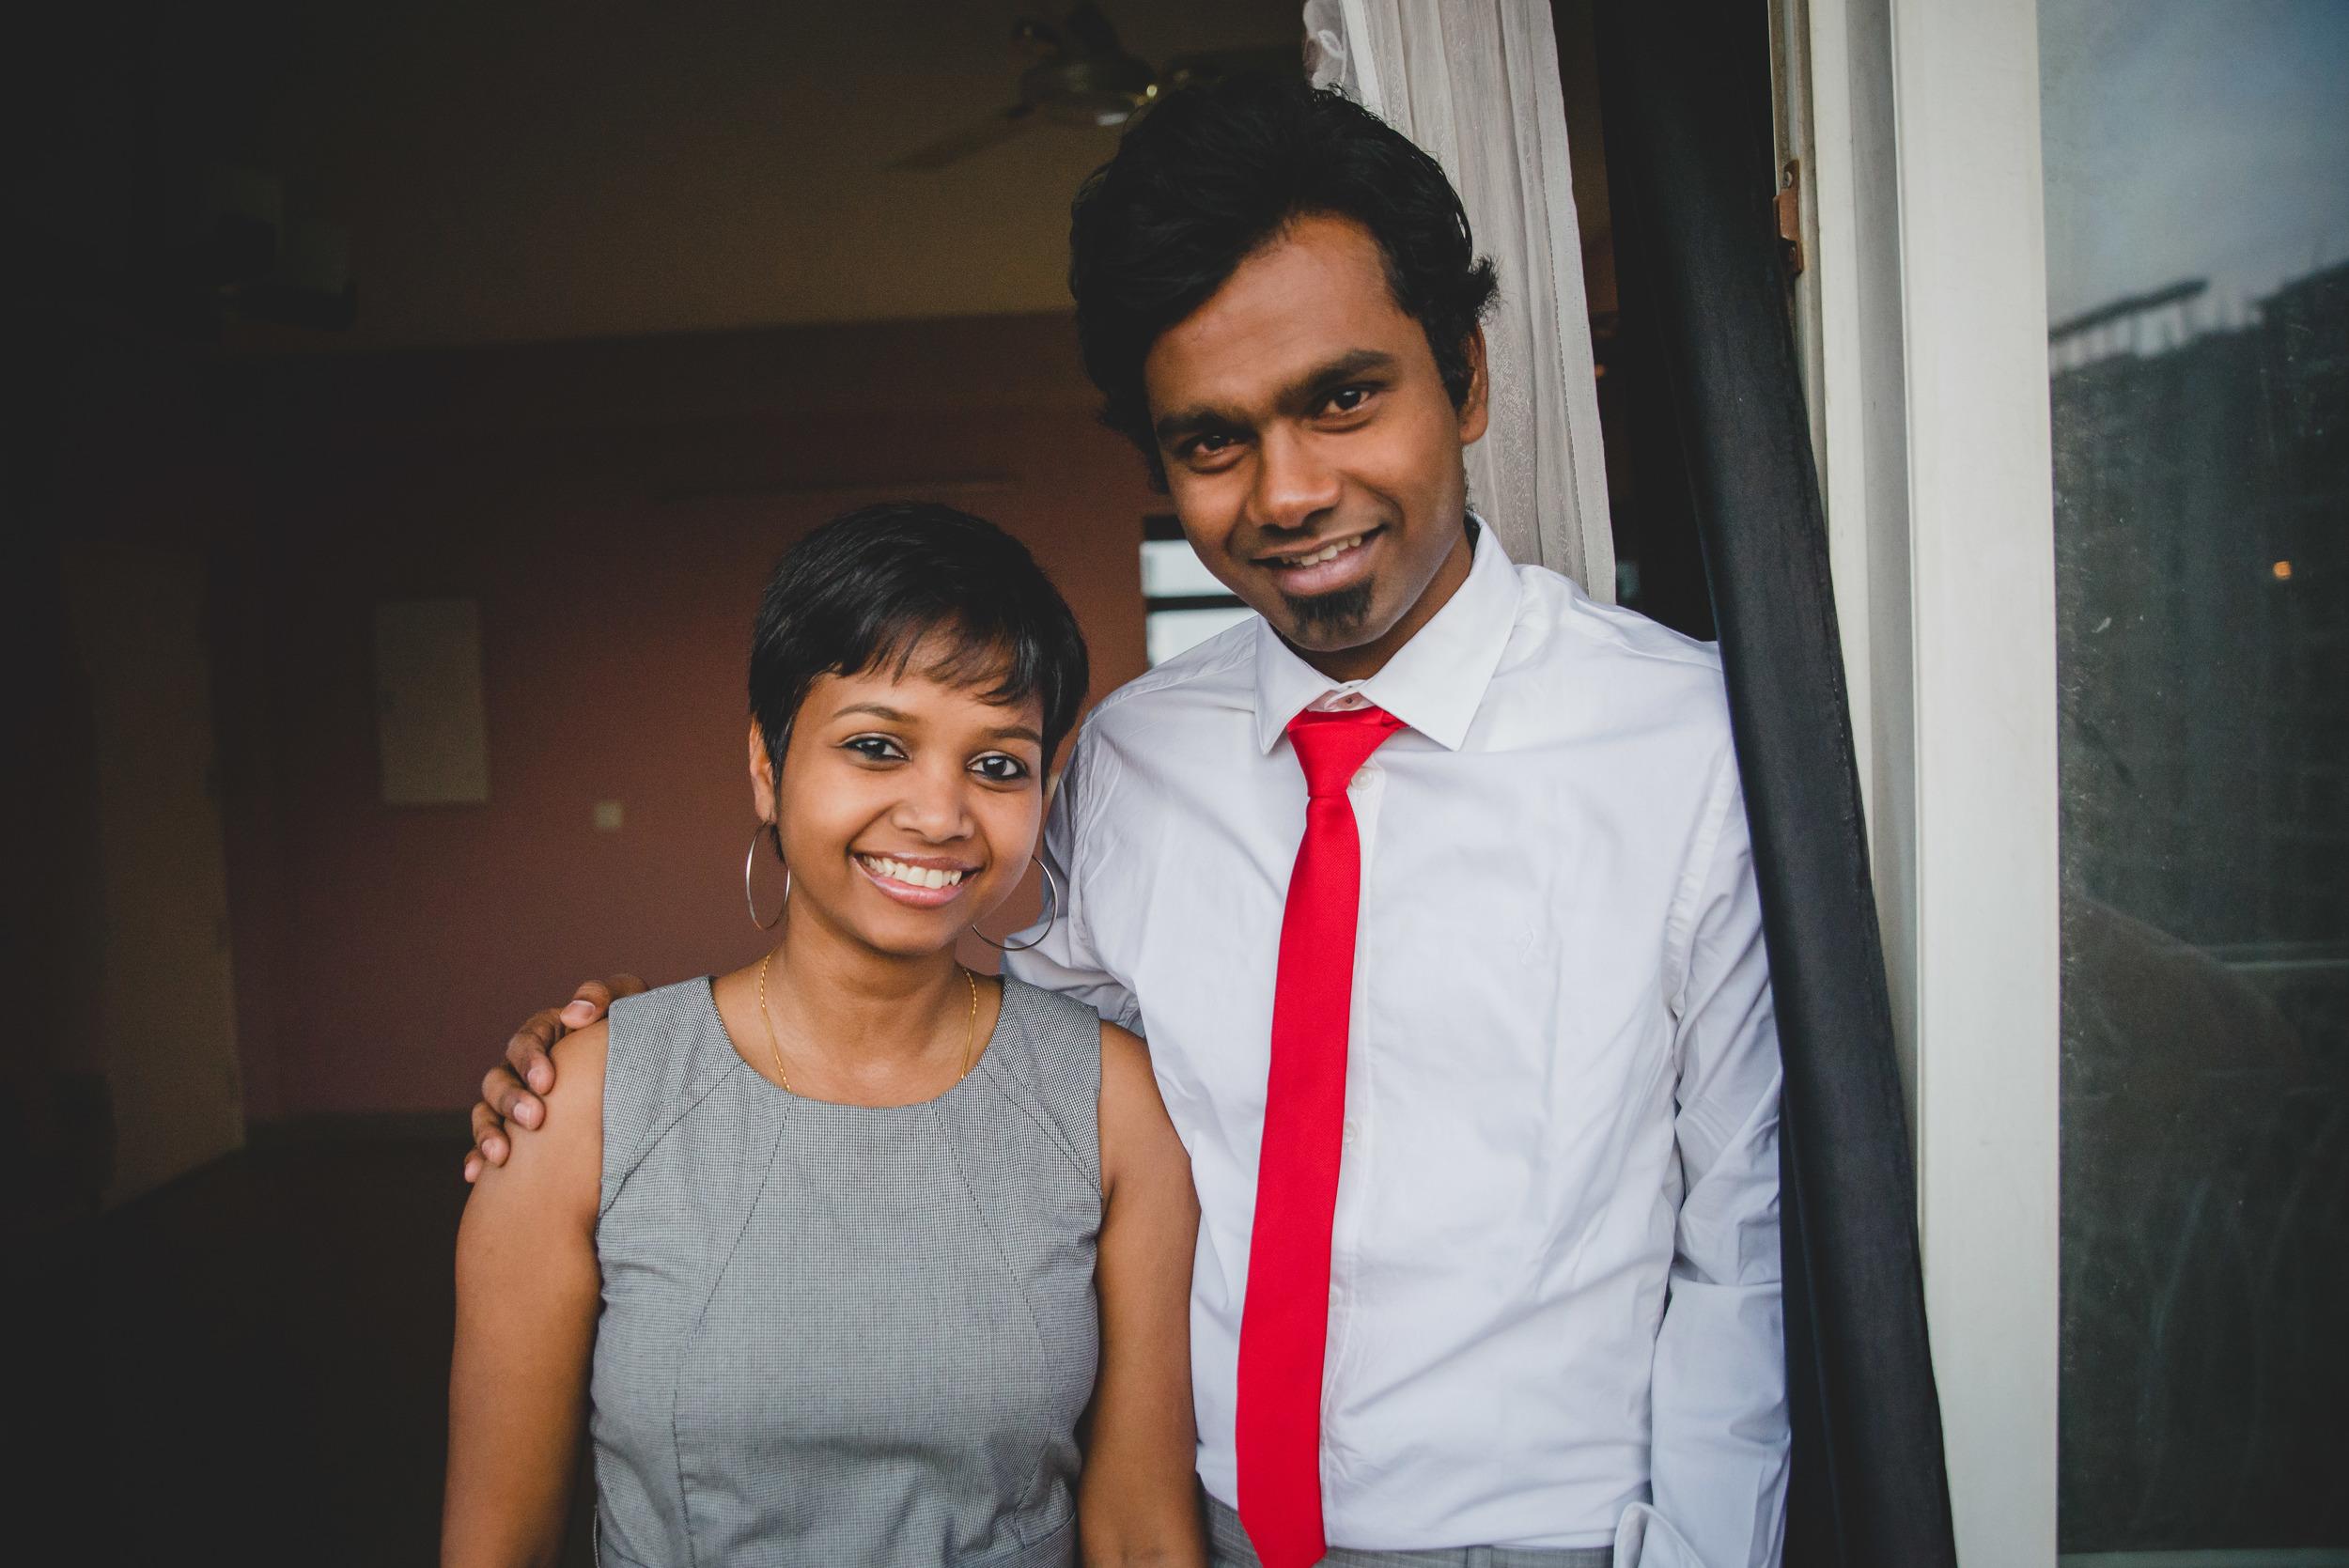 Manohar Paul and his wife, Sneha Purti Paul